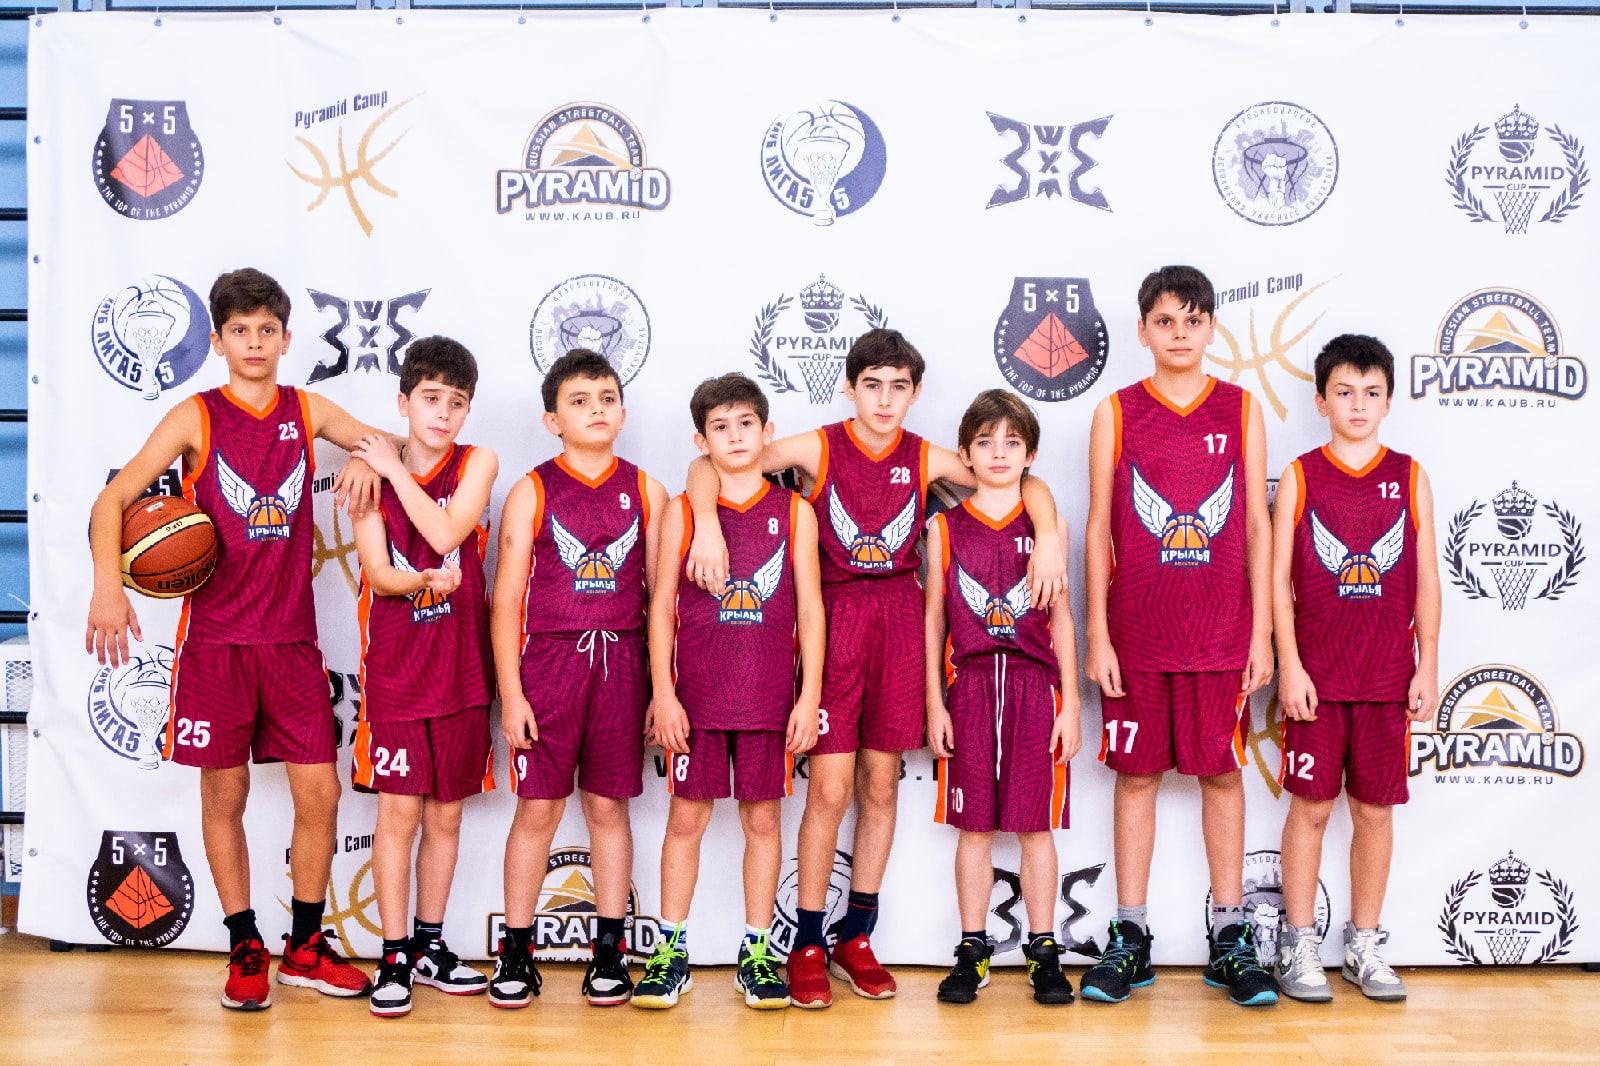 Pyramid Cup 3x3 Jr